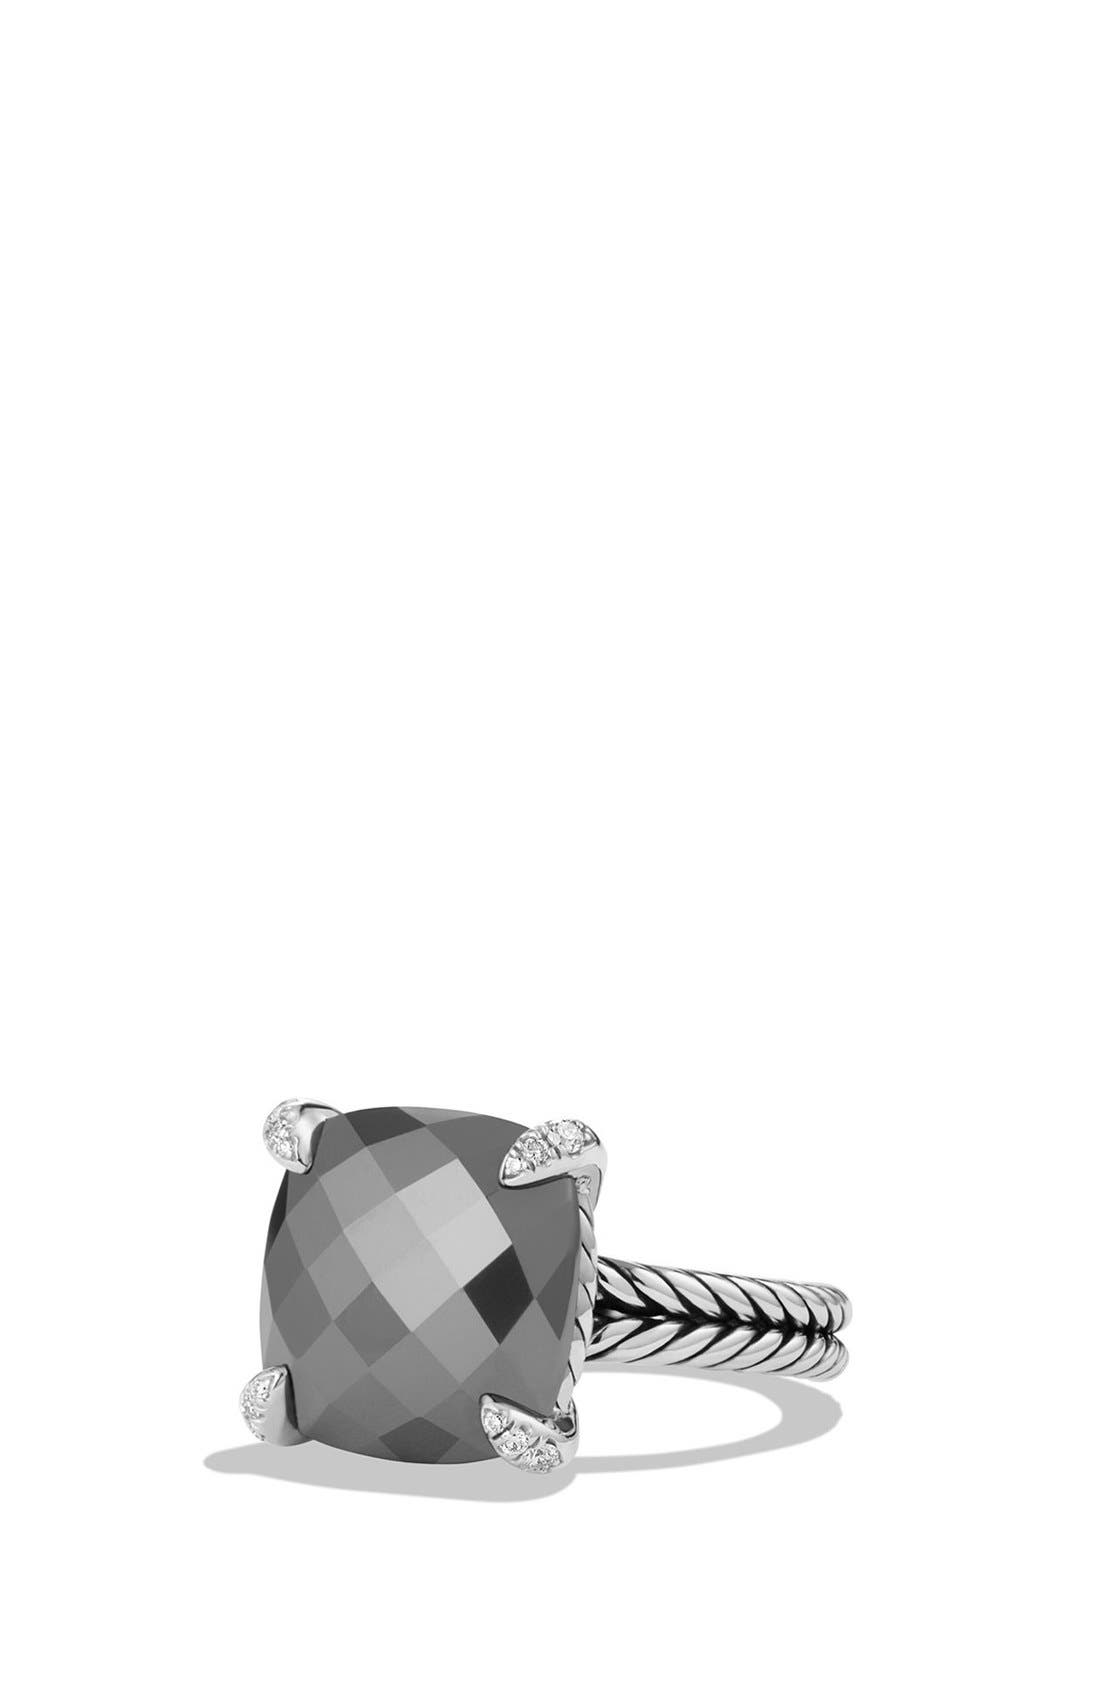 Main Image - David Yurman 'Châtelaine' Ring with Semiprecious Stone and Diamonds